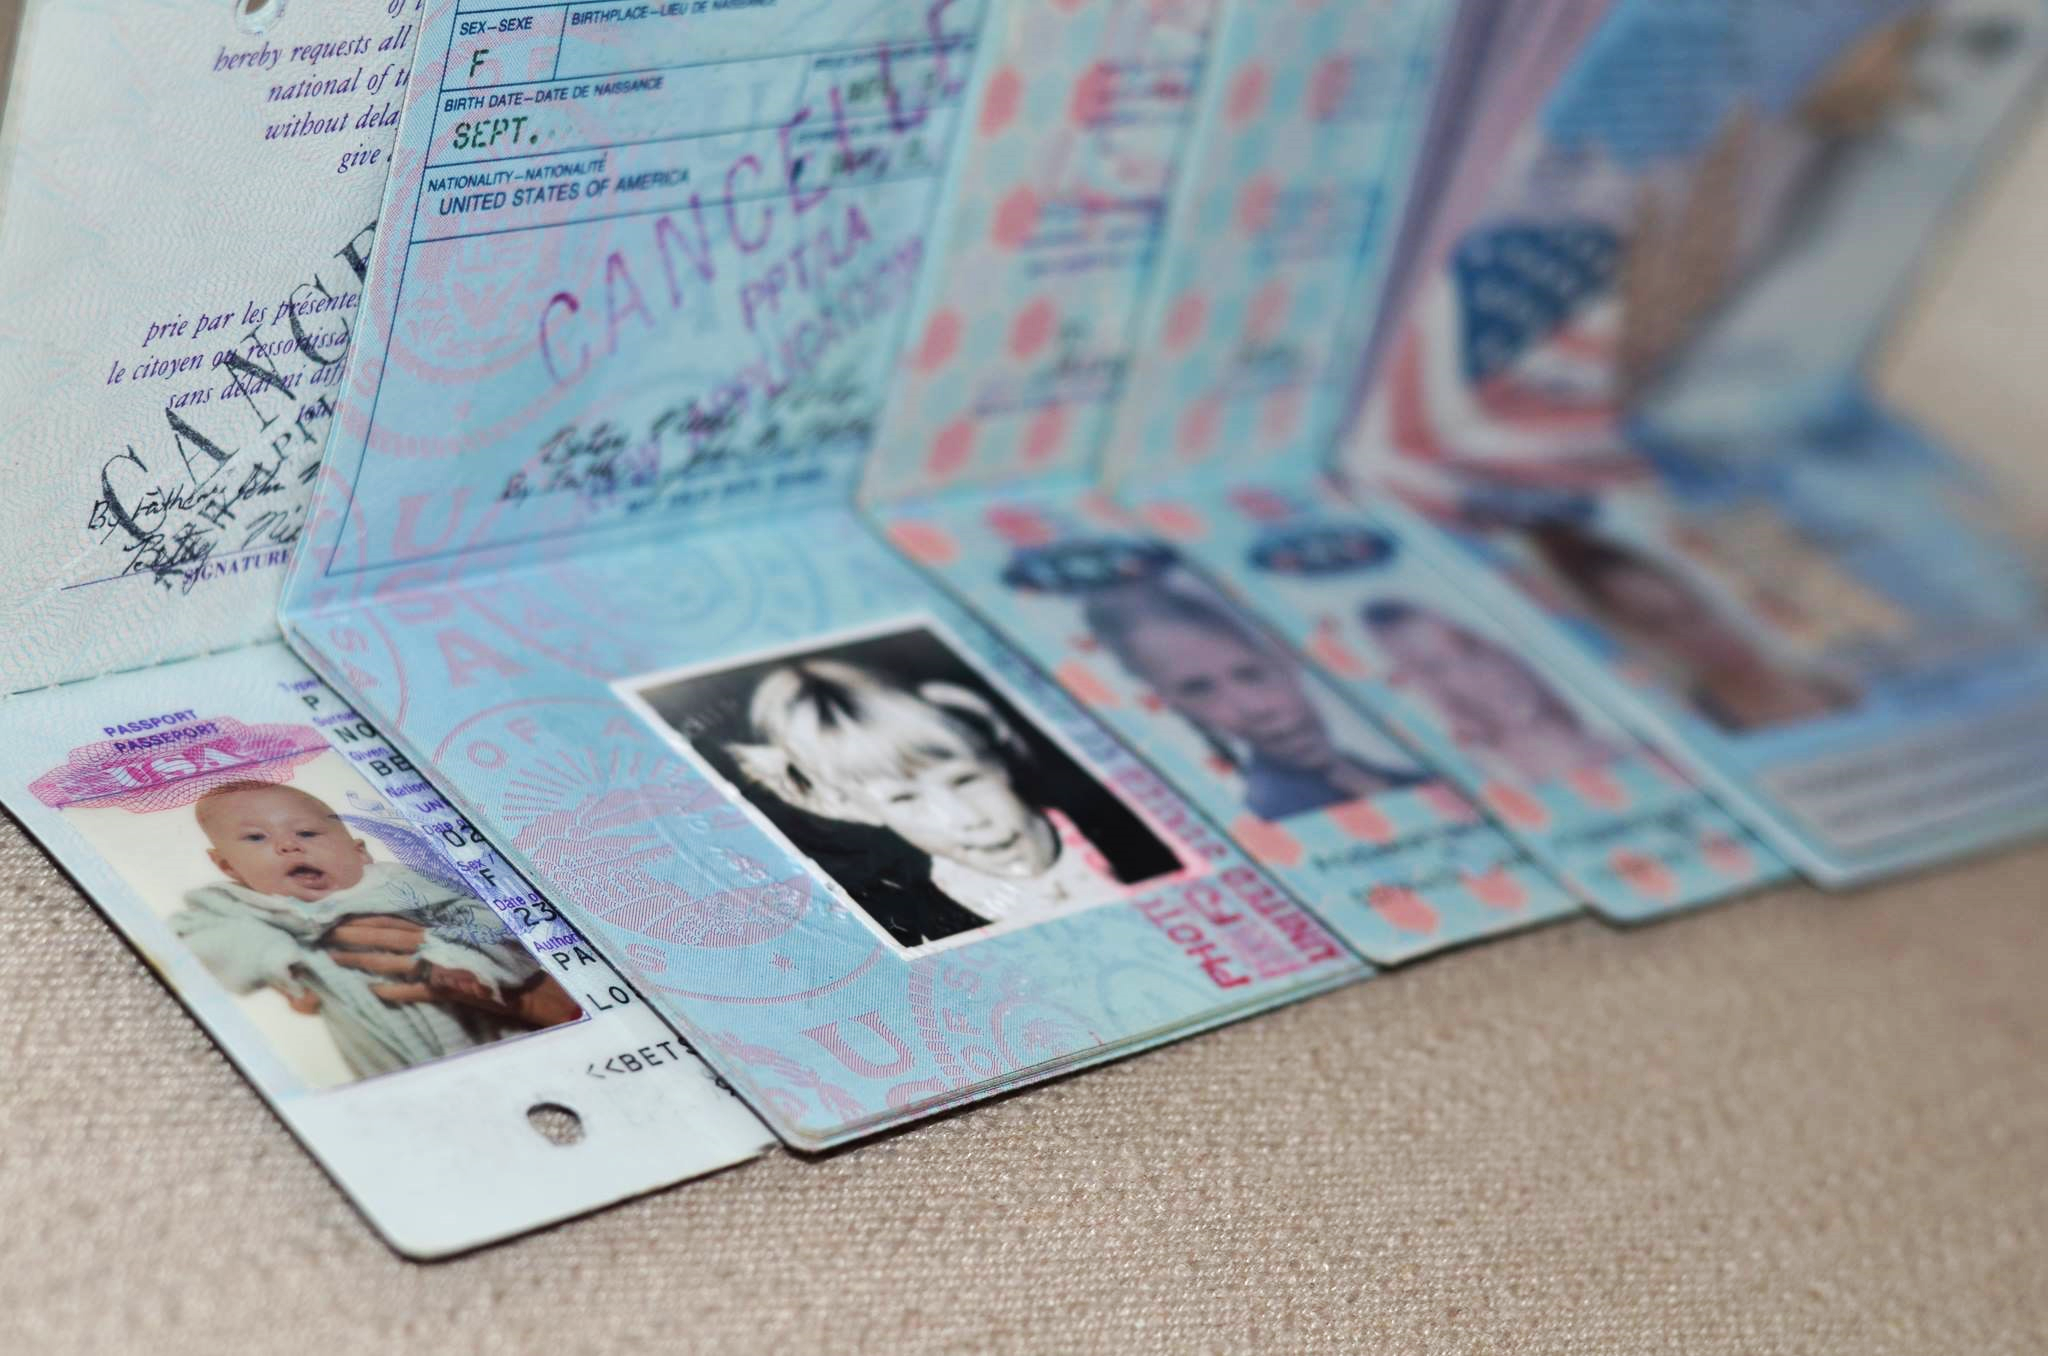 My five passports